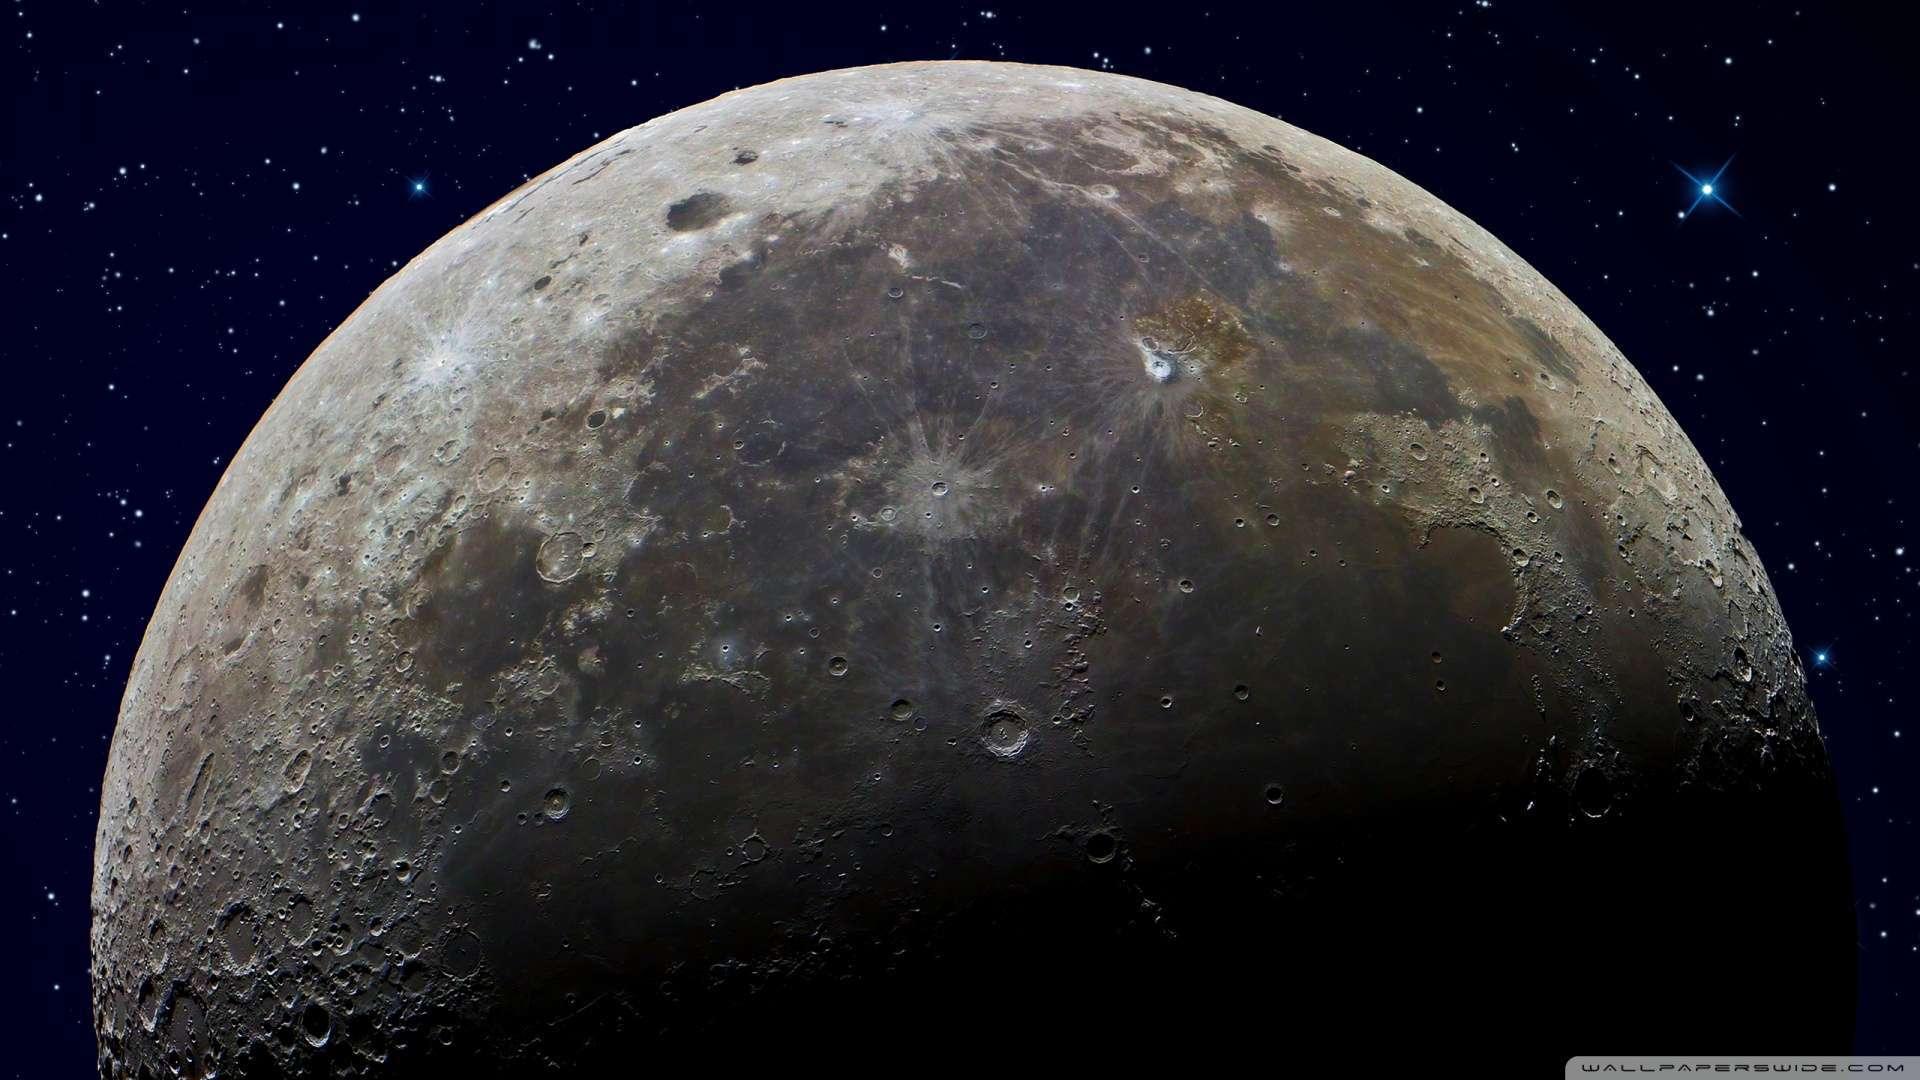 [41+] HD Moon Wallpaper 1080p On WallpaperSafari